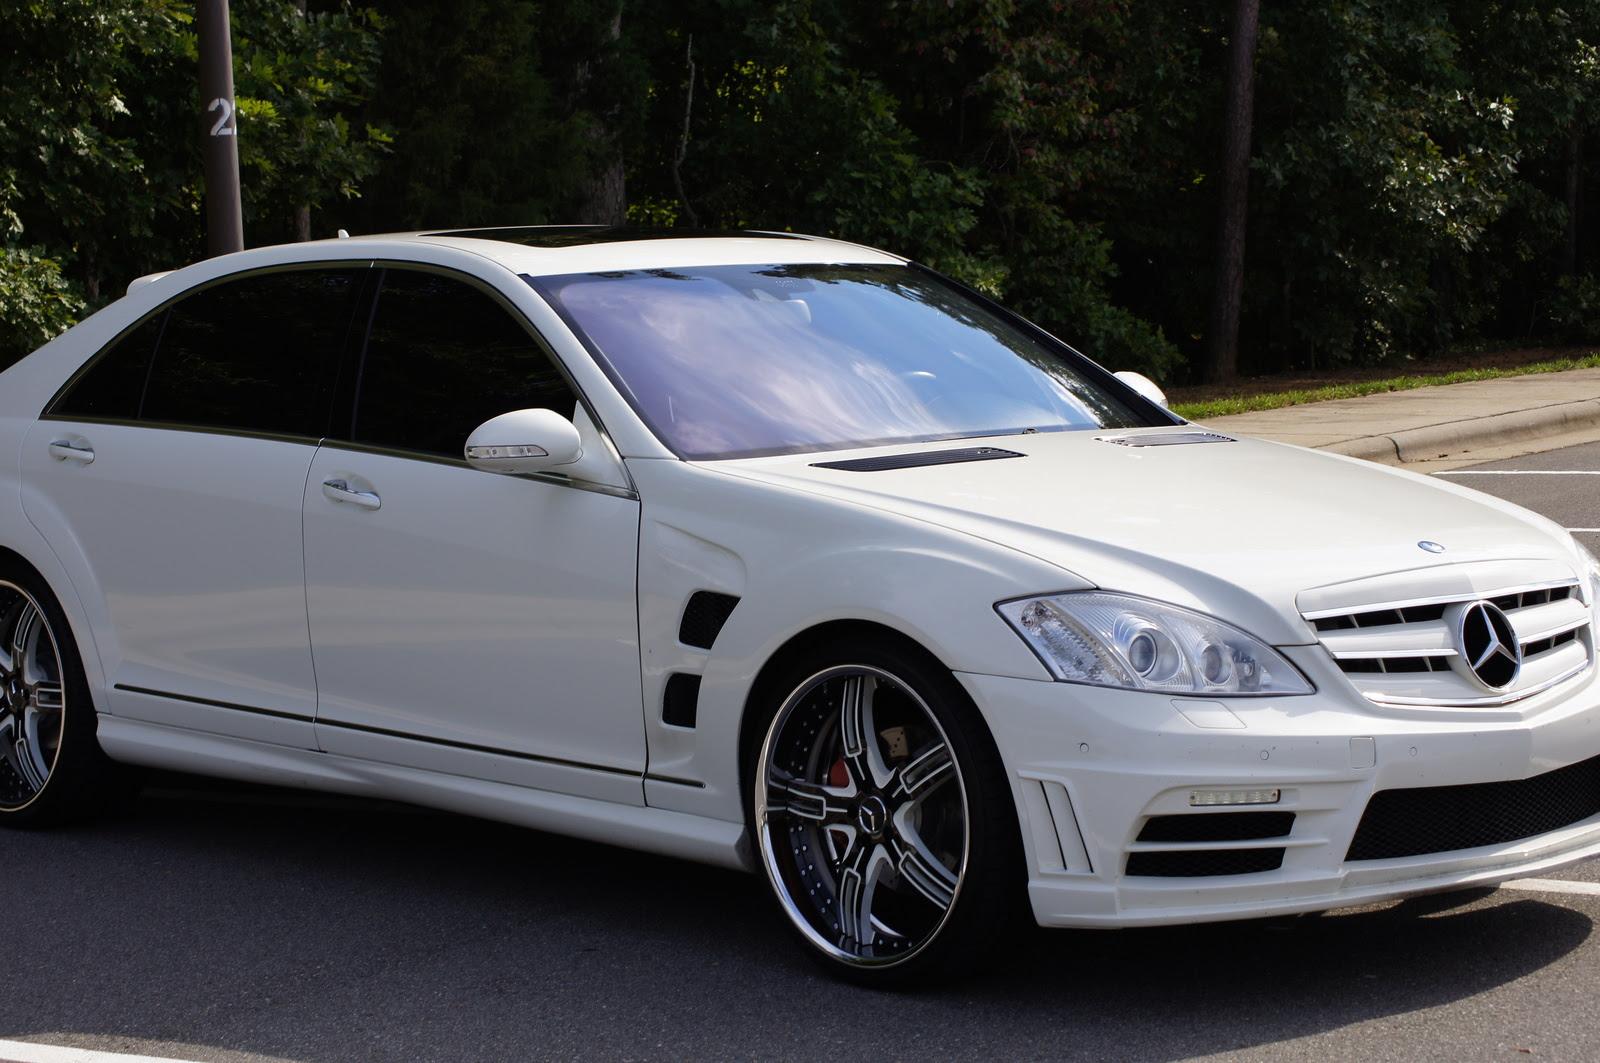 2008 Mercedes-Benz S-Class - Review - CarGurus